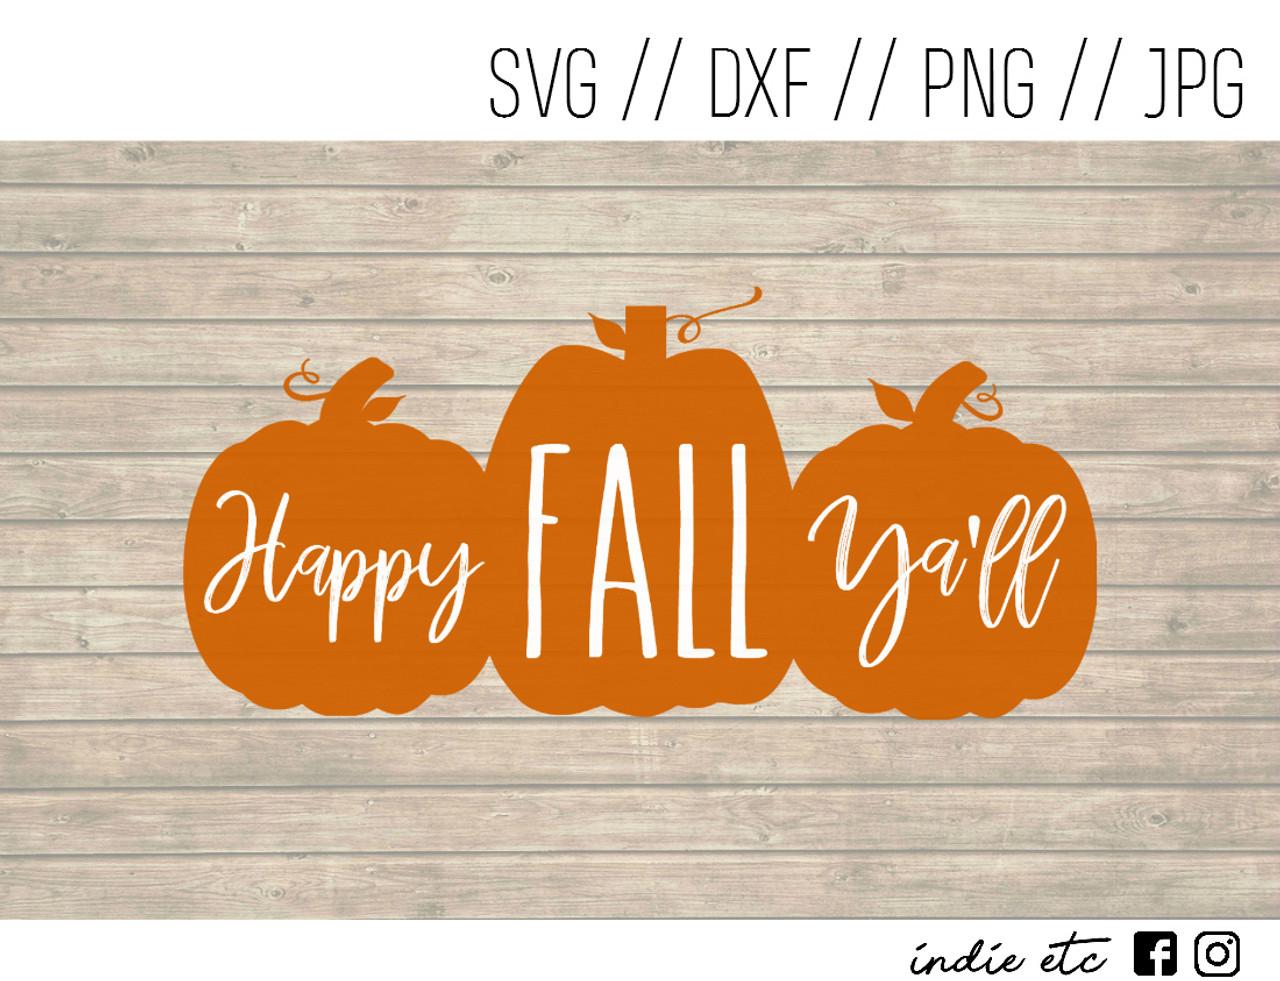 Download Happy Fall Ya'll Digital Art File (svg, dxf, png, jpeg)